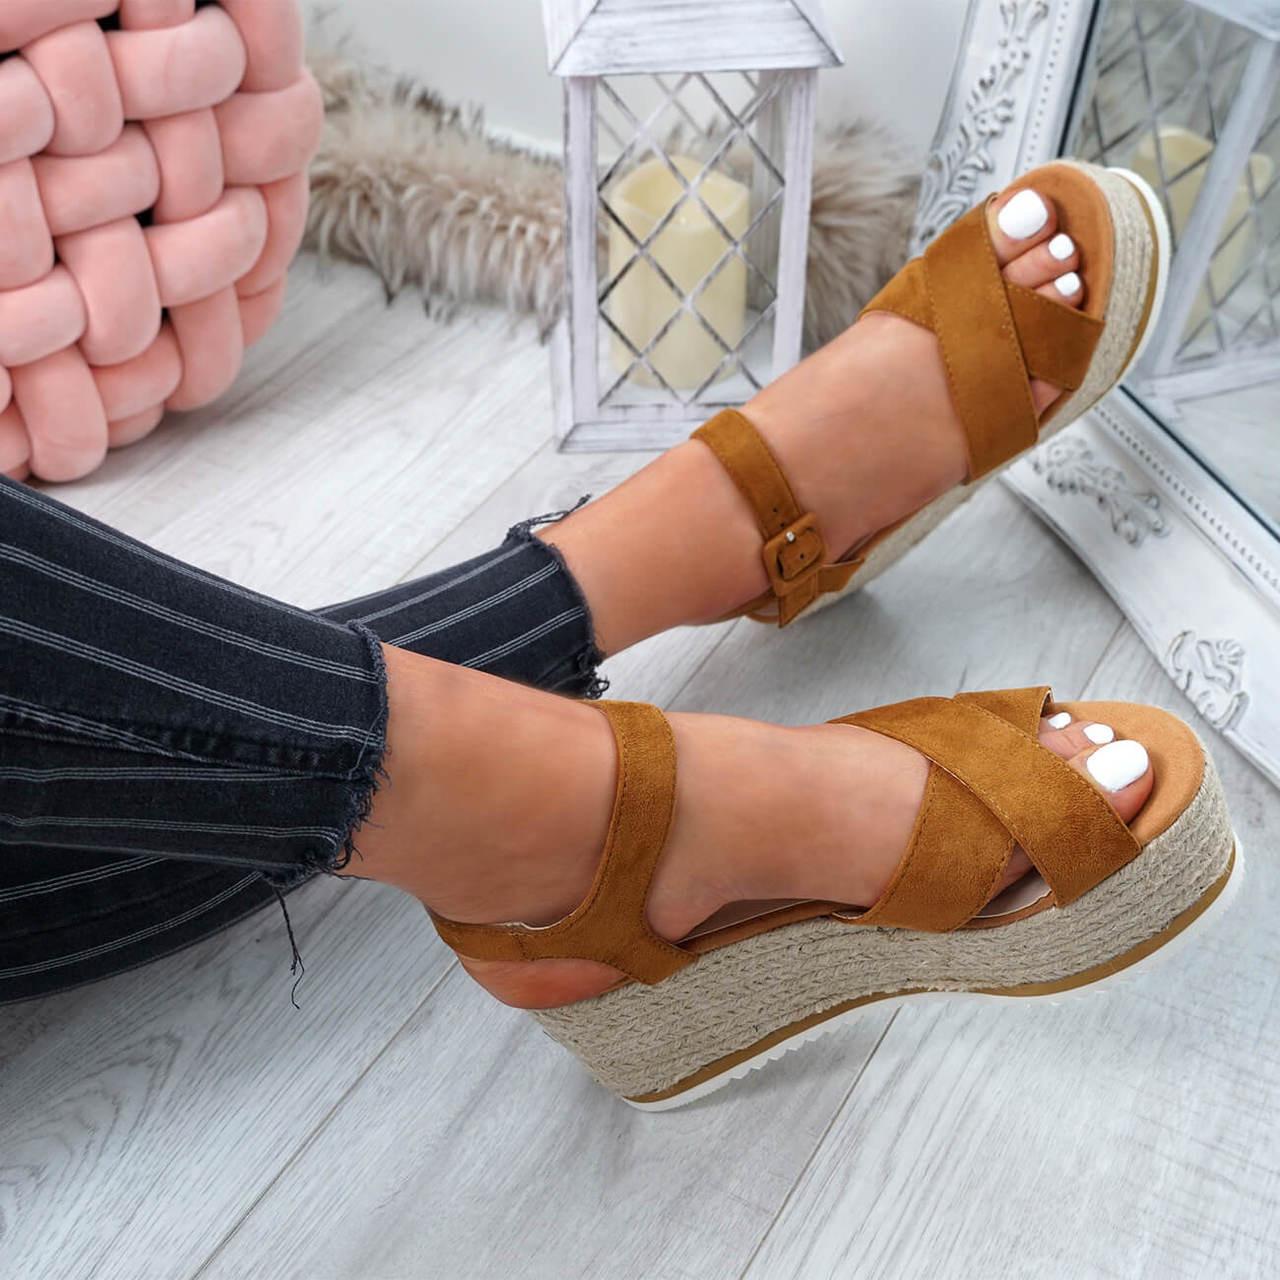 ac215df8717 Amyt Camel Espadrille Wedge Sandals